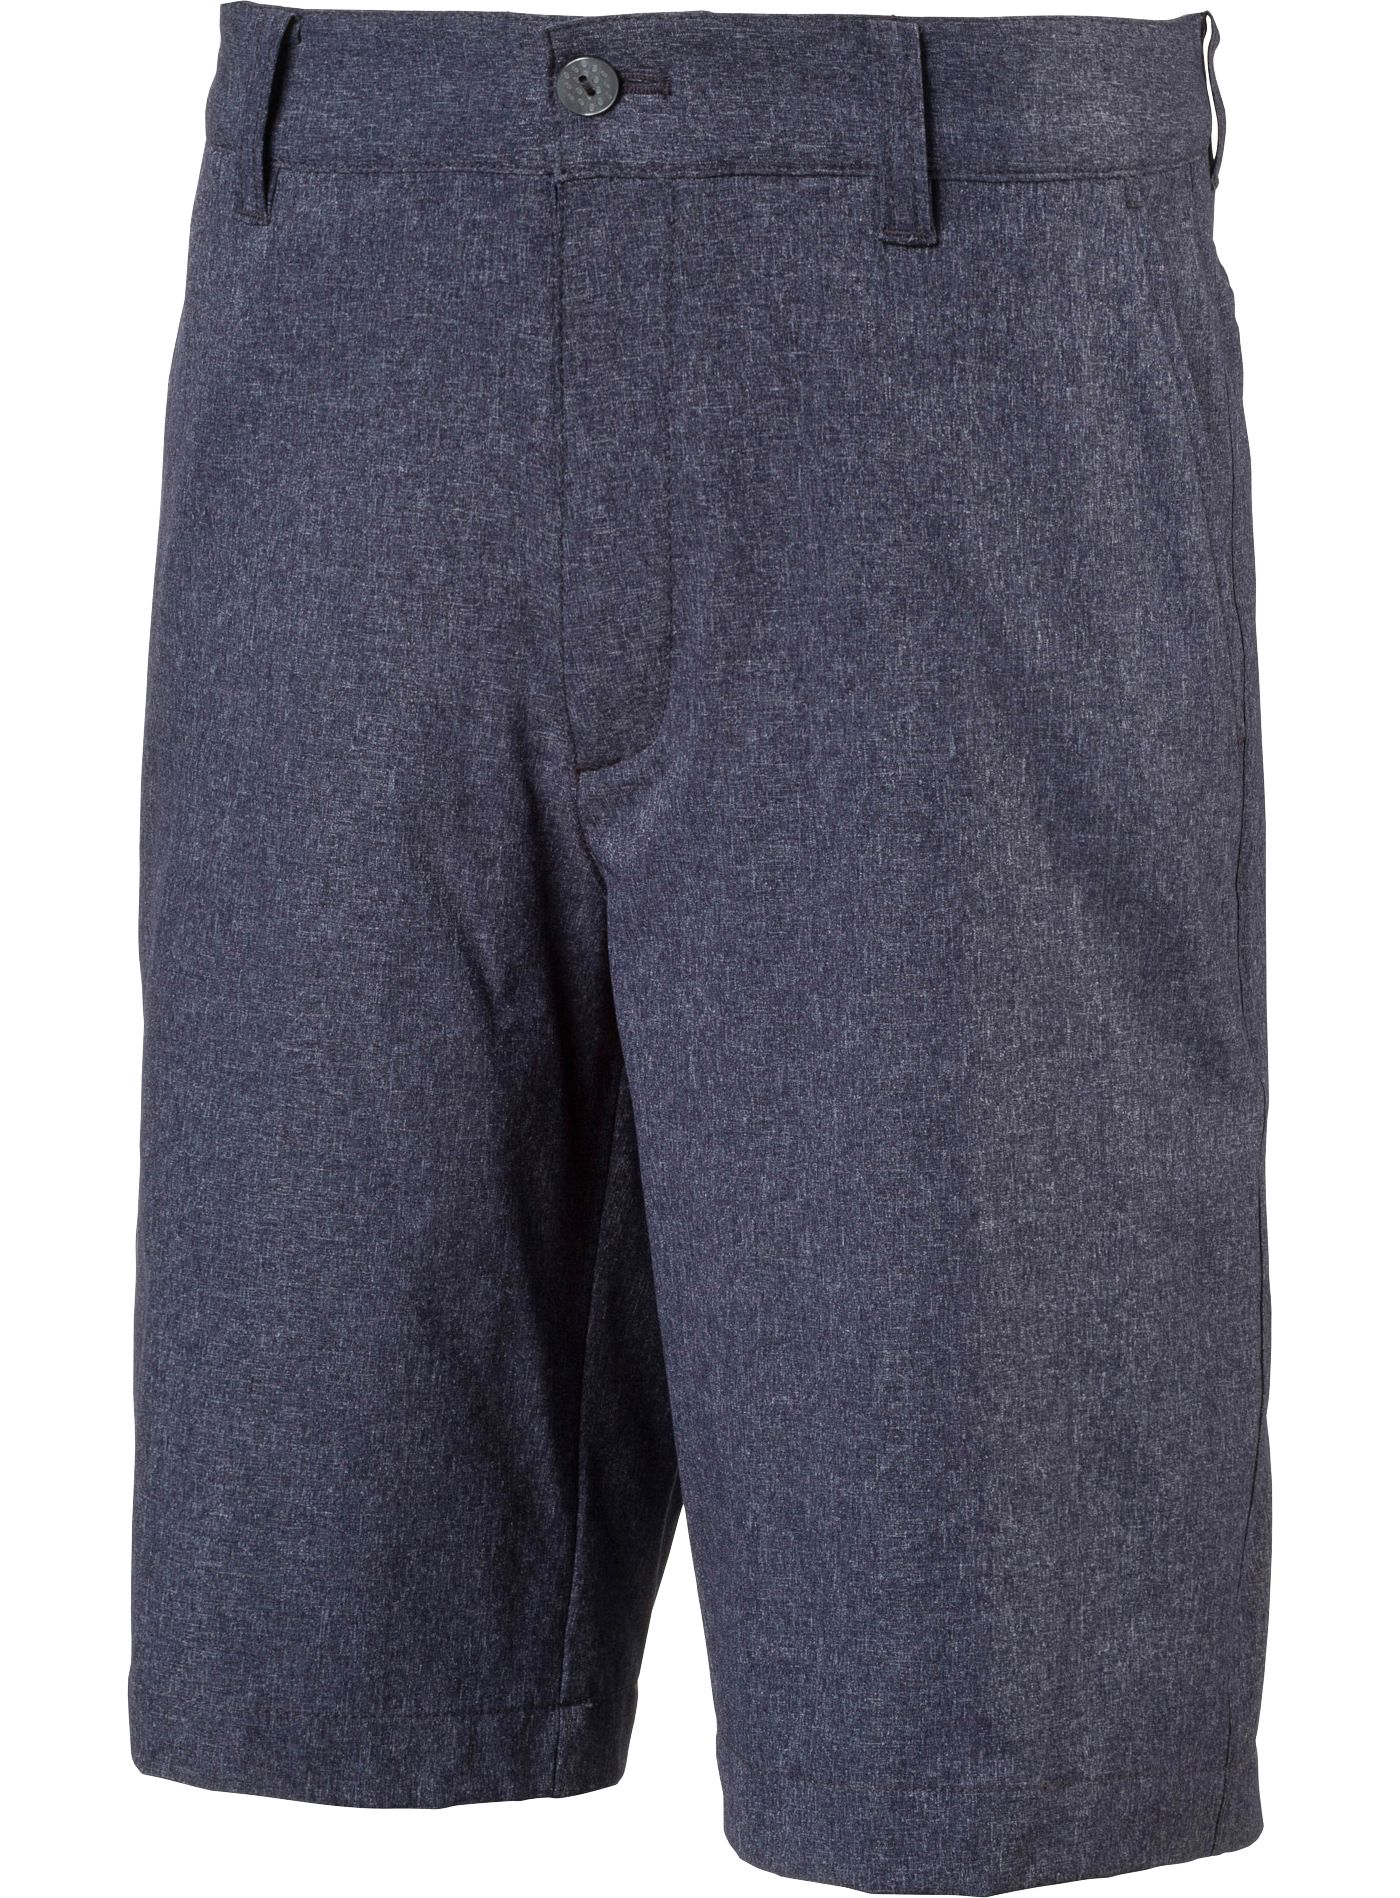 PUMA Men's Heather 6 Pocket Golf Shorts